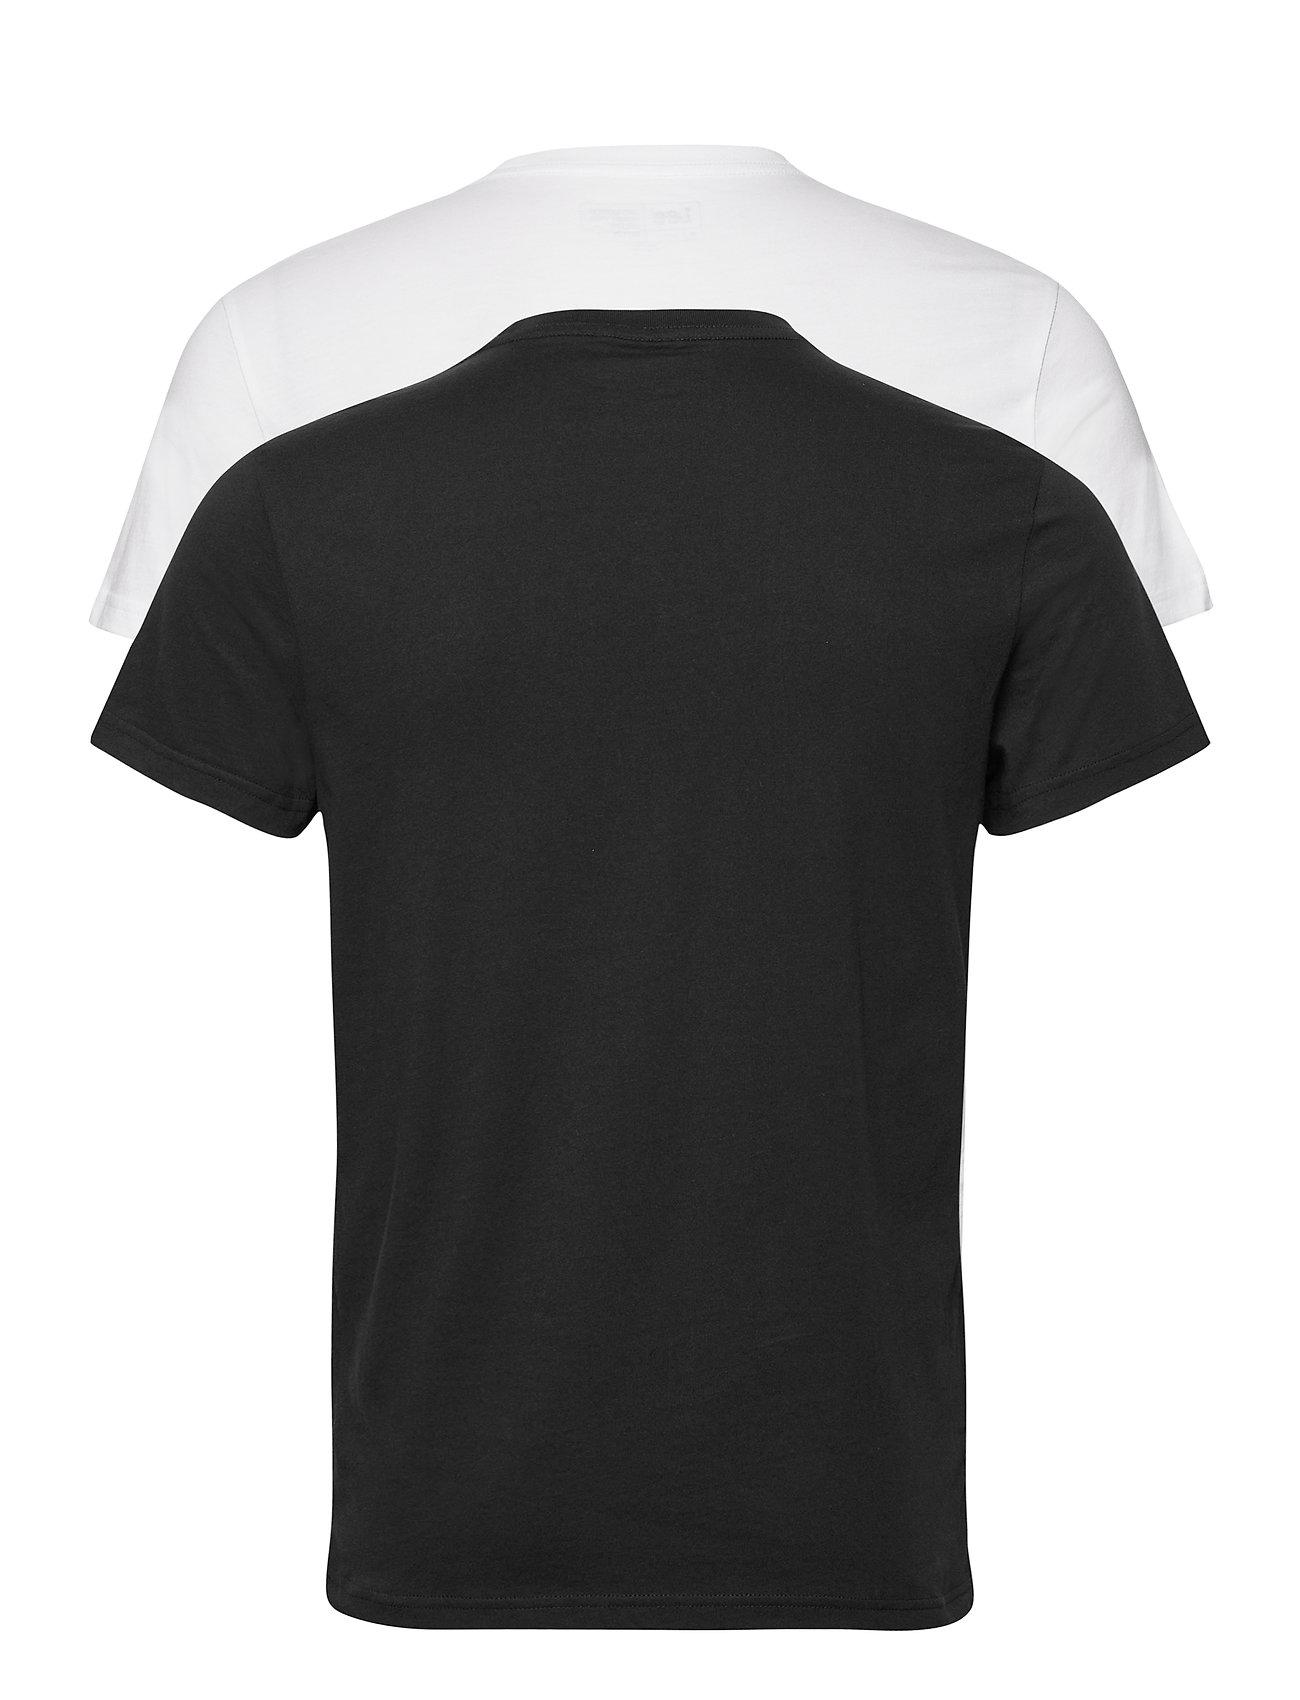 Lee Jeans - 2-PACK CREW - basic t-shirts - black white - 1